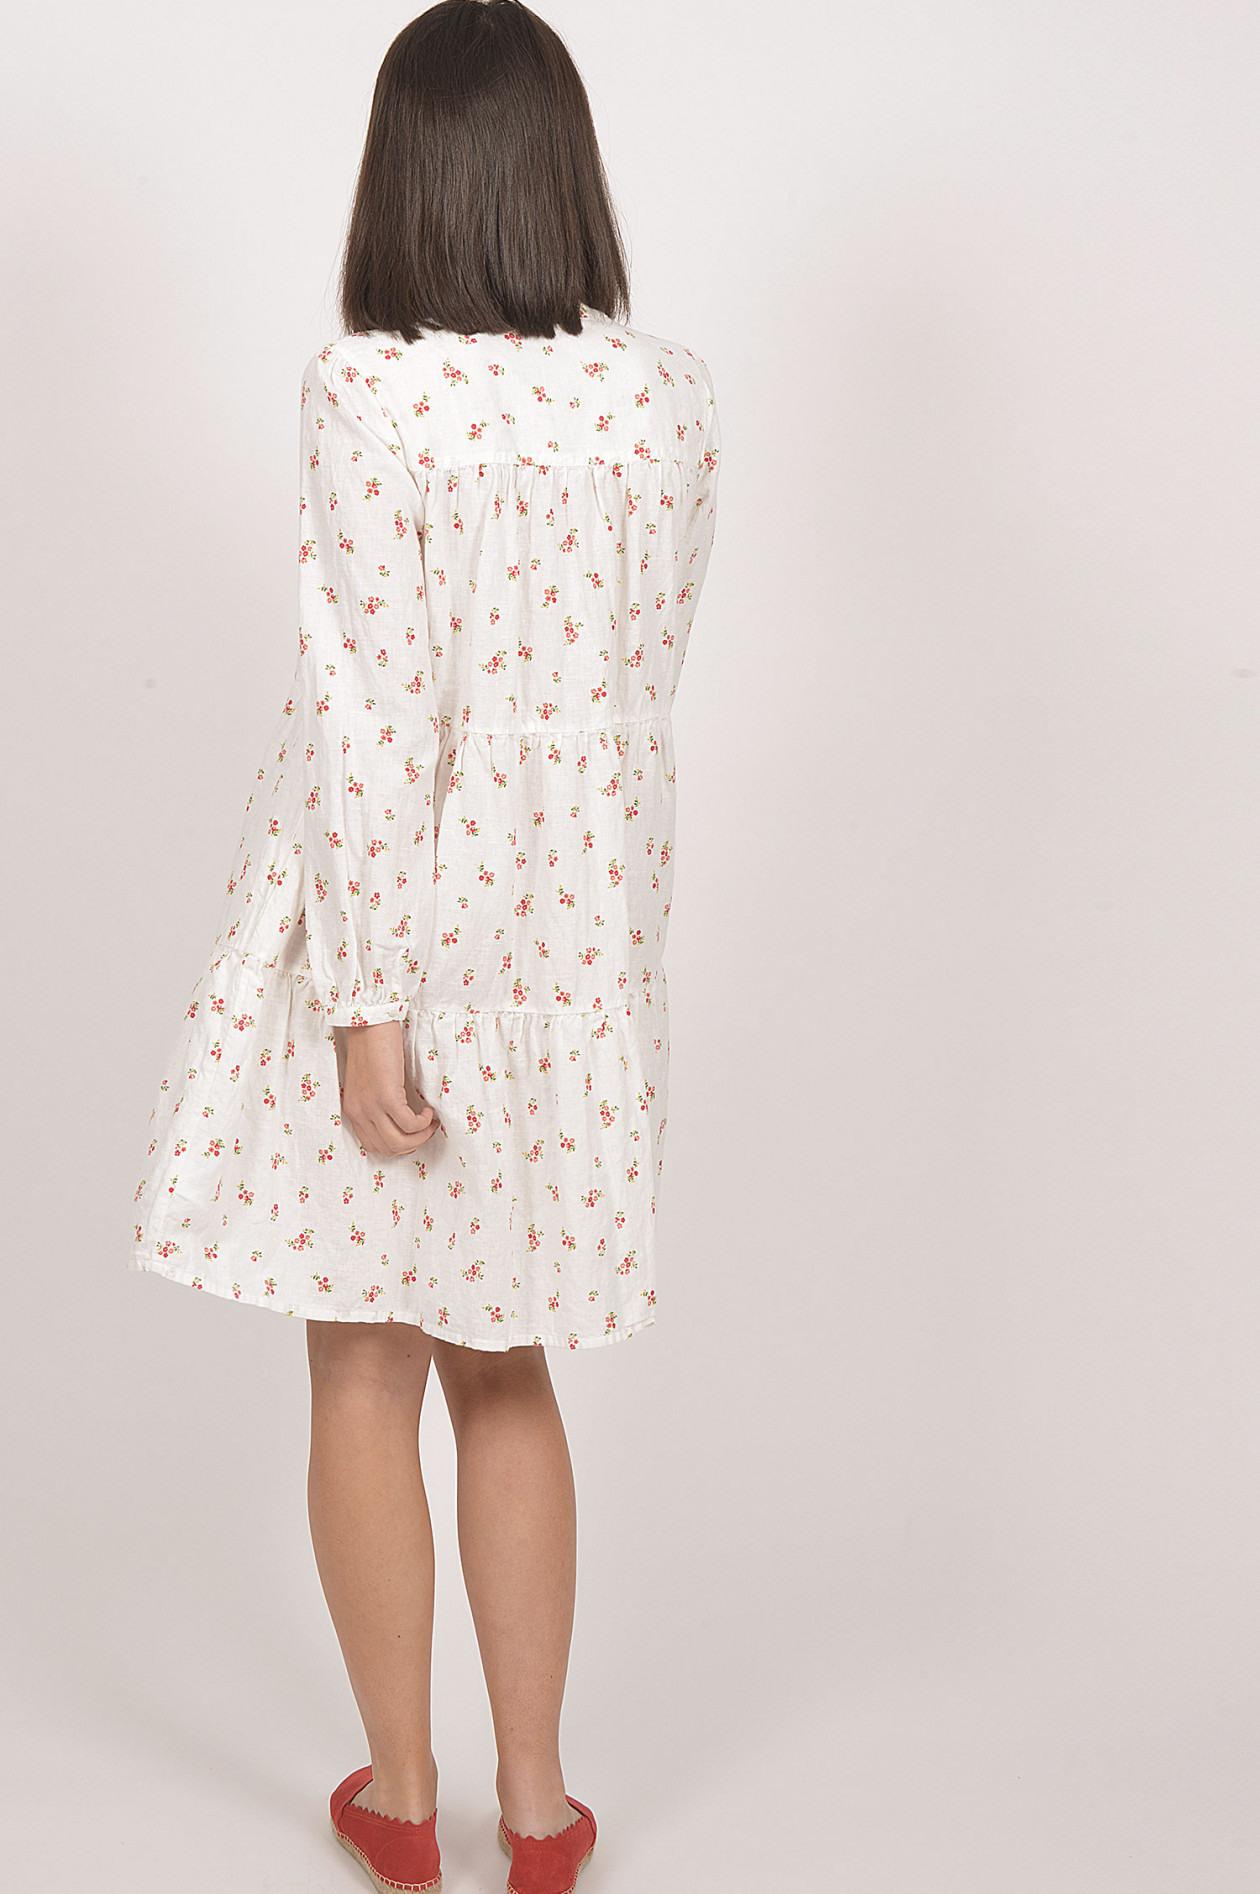 Robert Friedman Kleid Mit Blumenprint In Weiß/Rot  Gruenerat